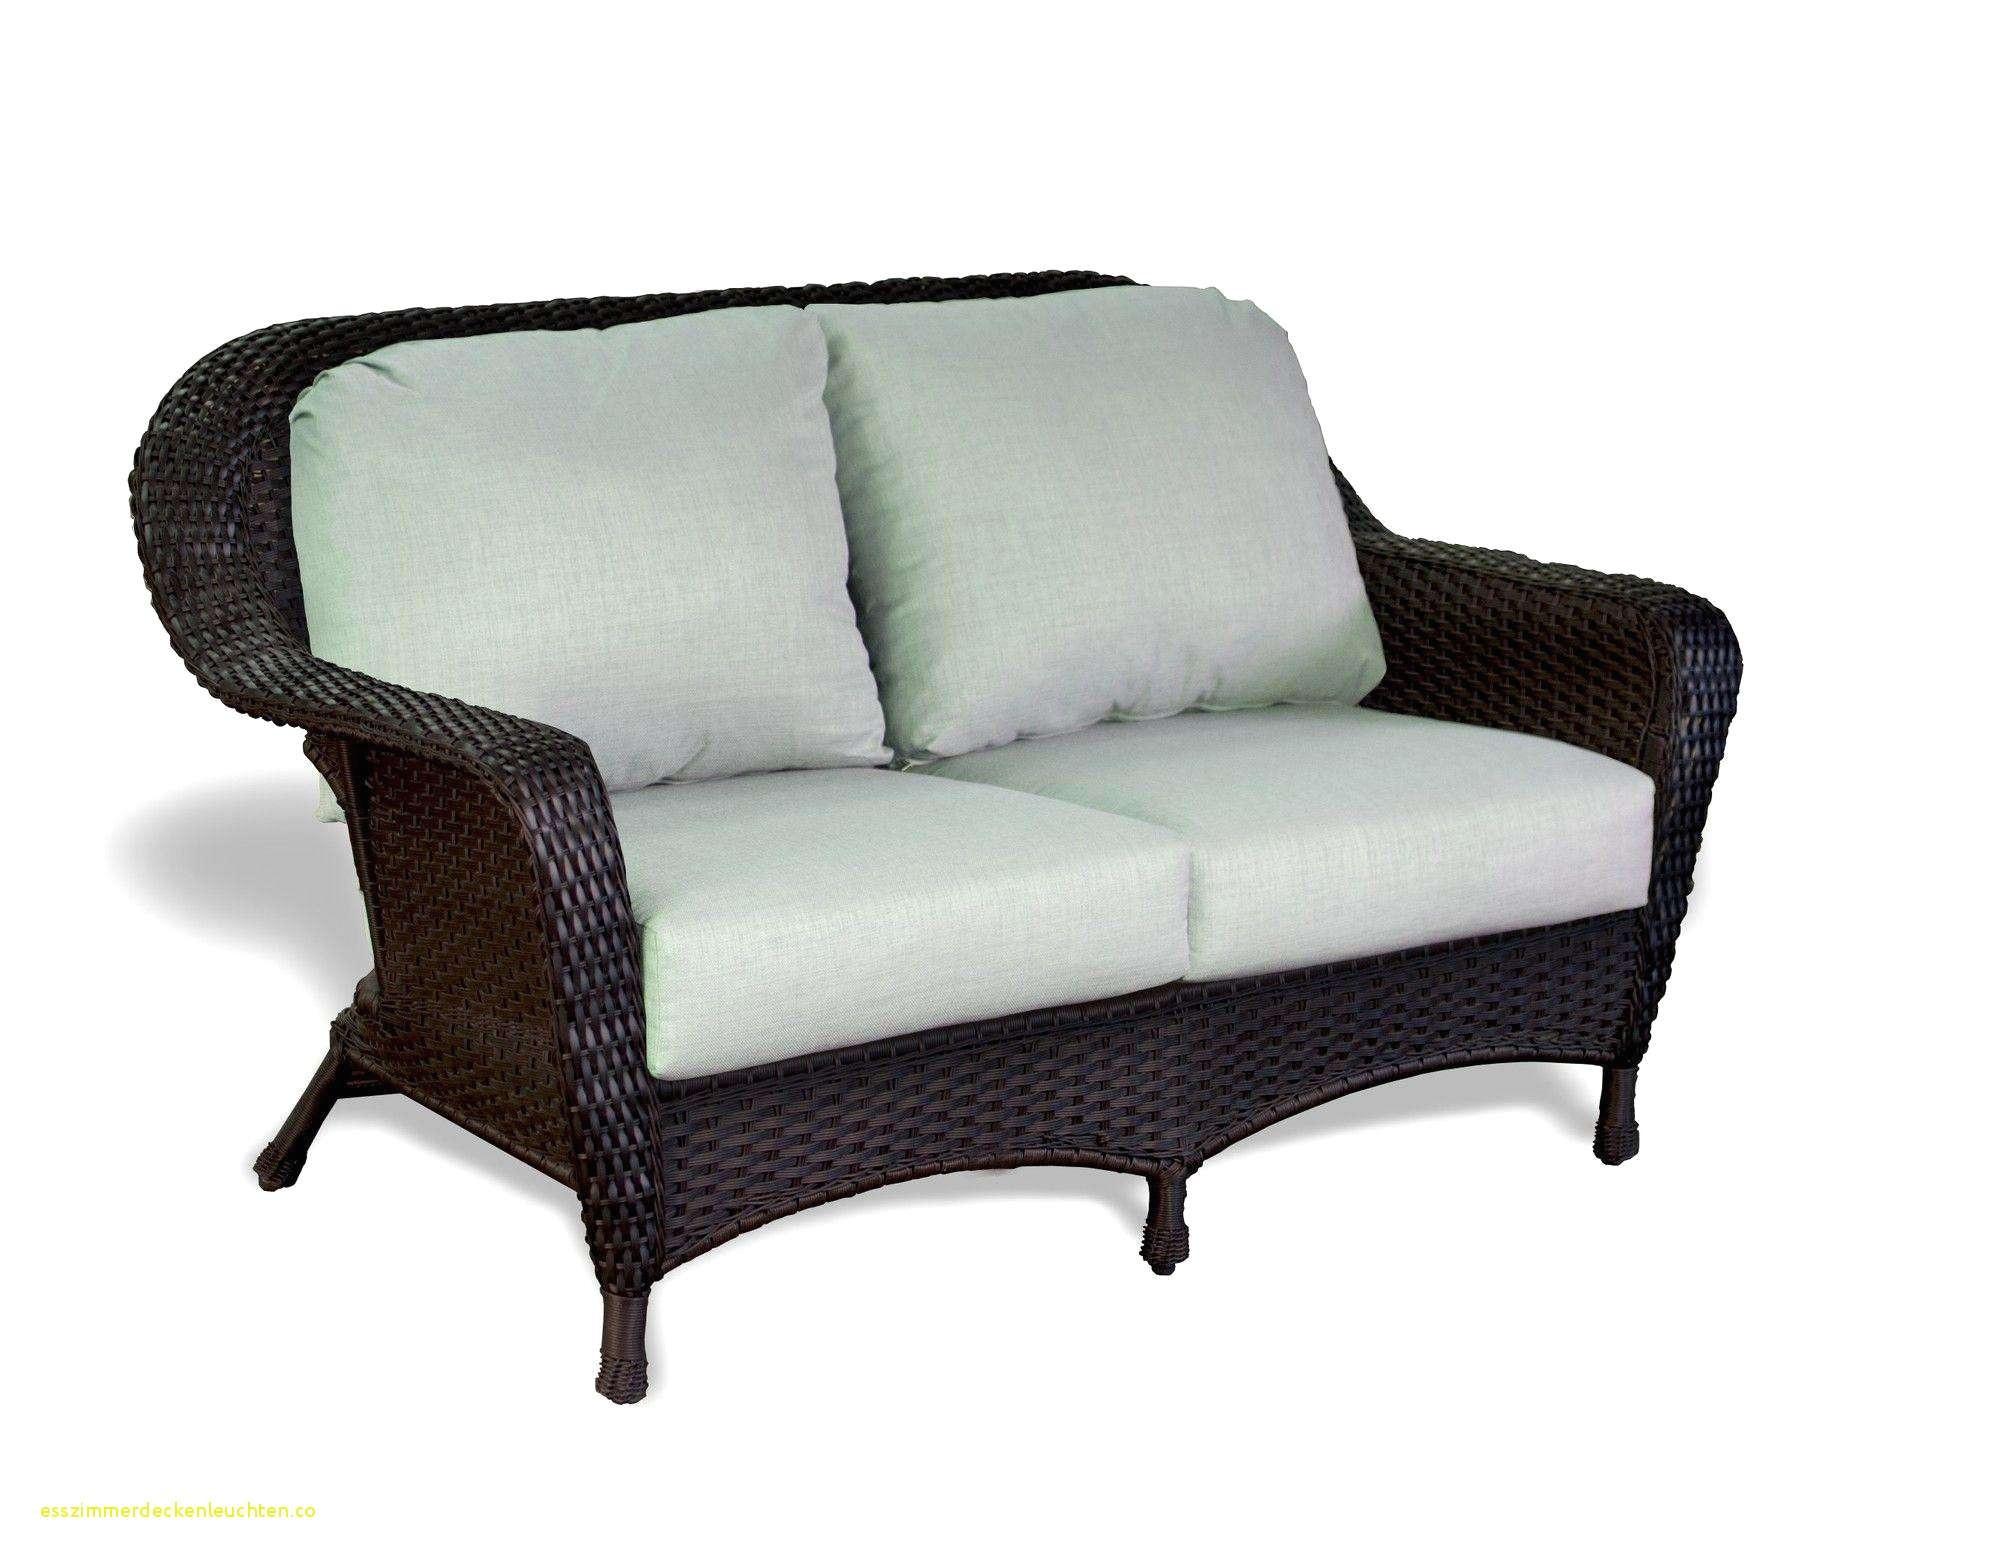 sofa bei ikea luxus 31 genial sofa mit bettkasten pic galerie of sofa bei ikea elegant